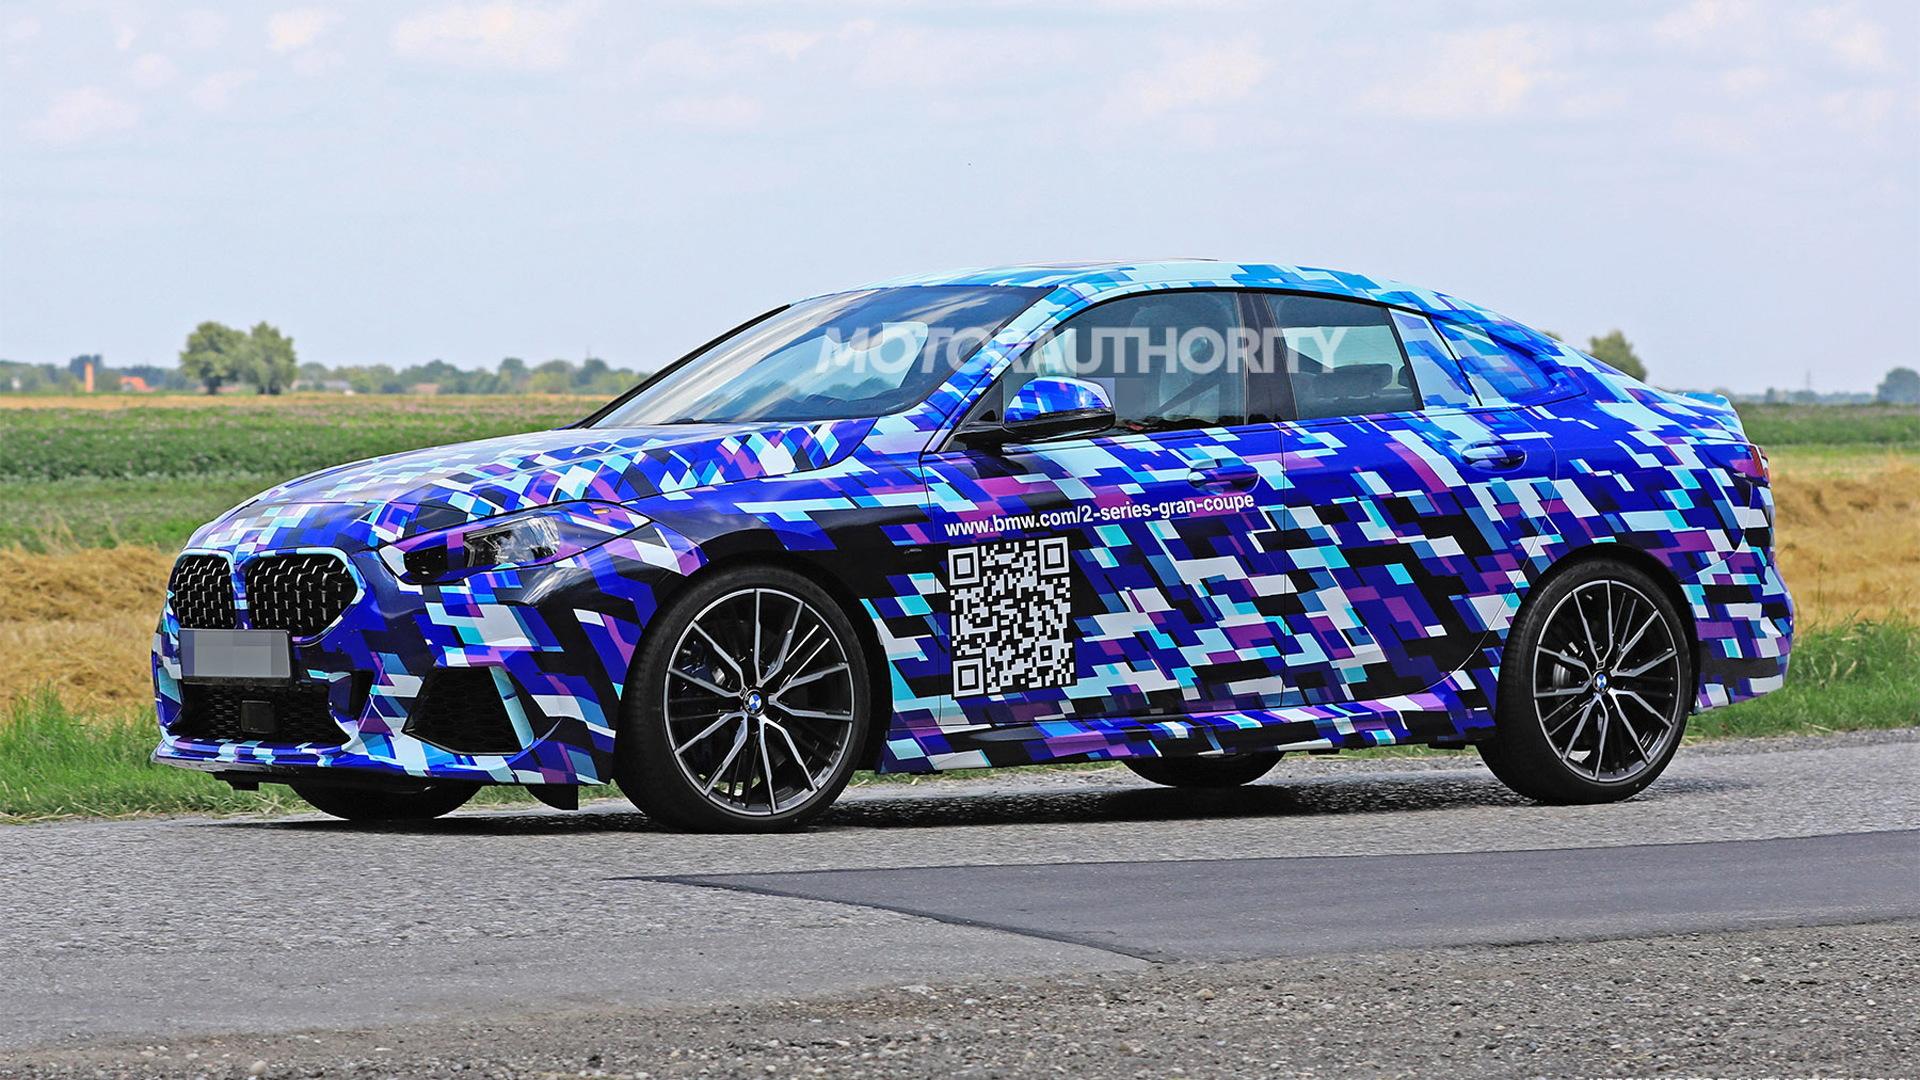 2021 BMW 2-Series Gran Coupe spy shots - Image via S. Baldauf/SB-Medien